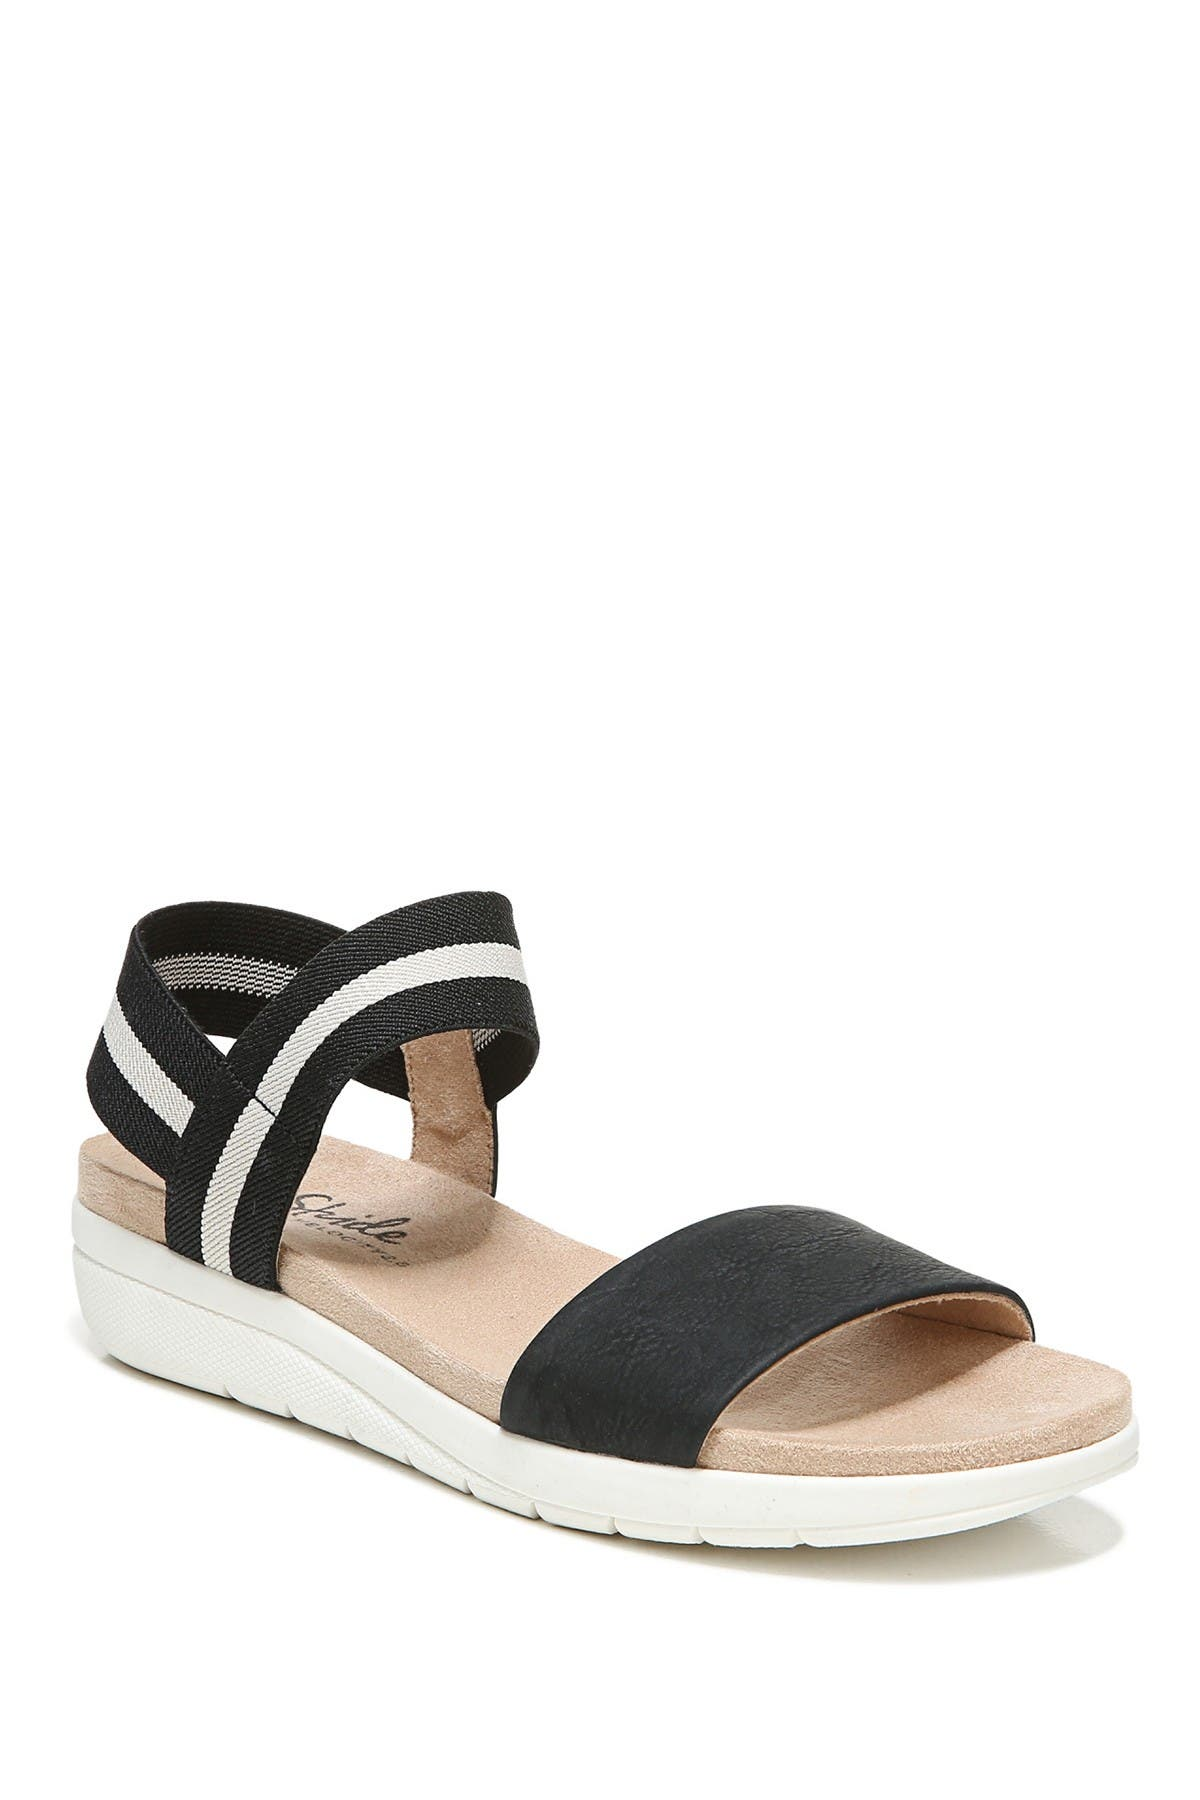 Image of LifeStride Pure Sandal